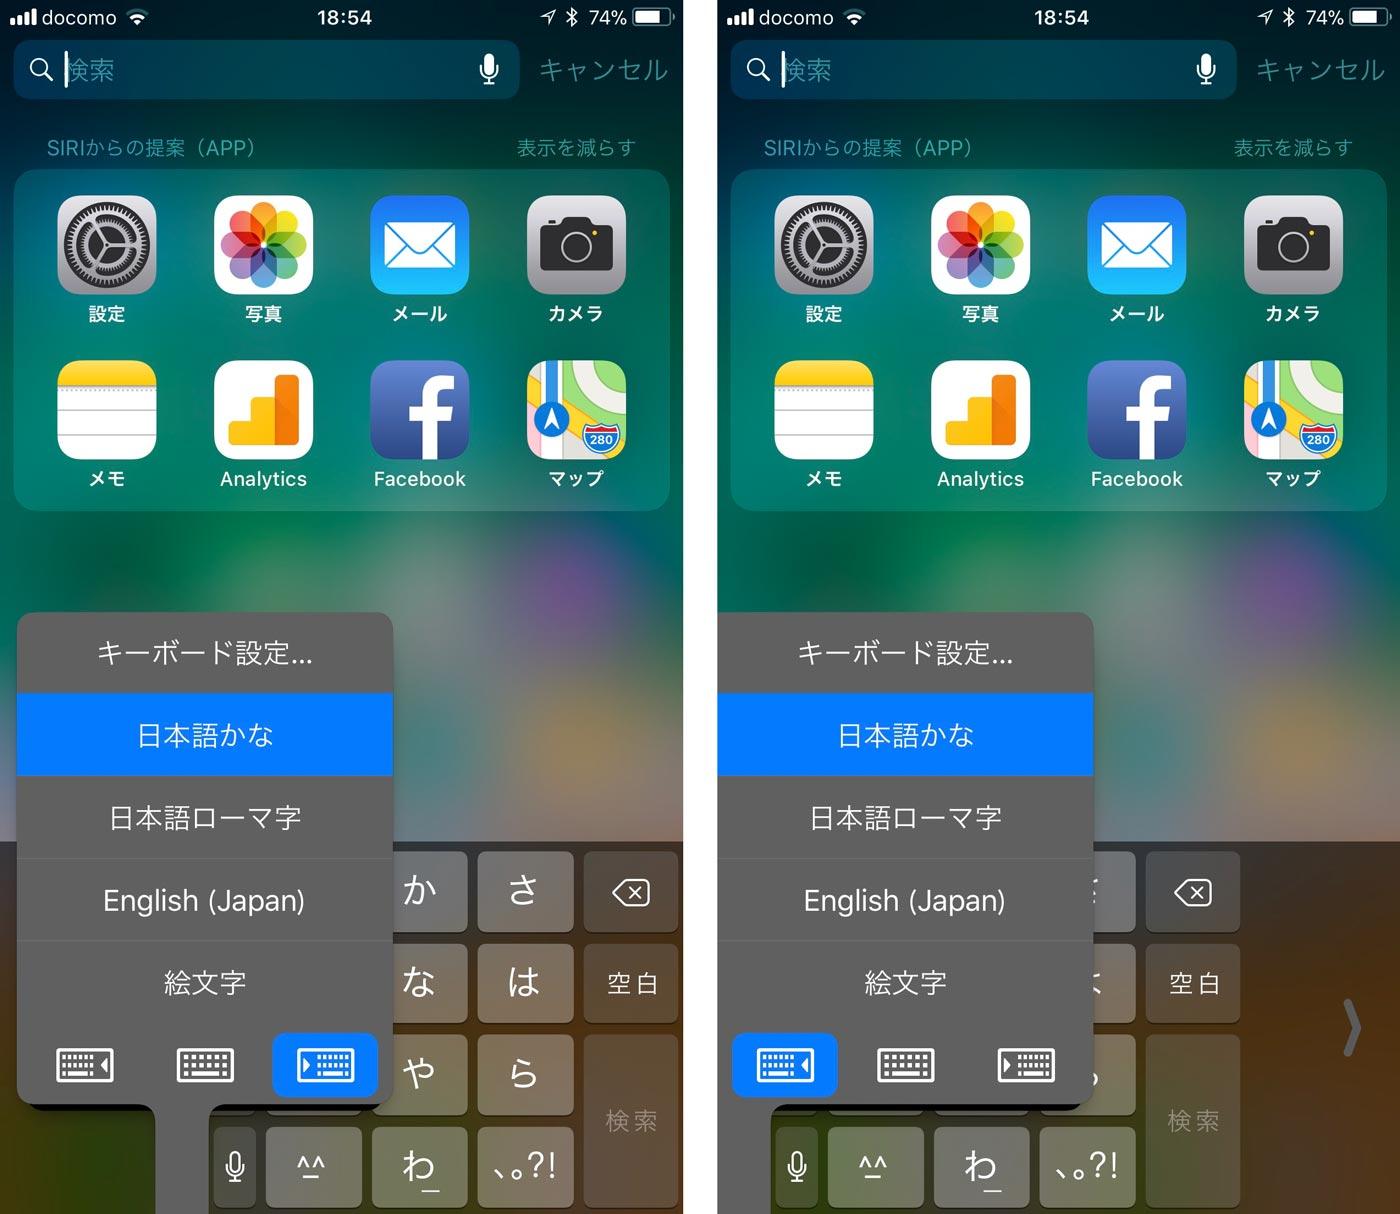 iOS11 ソフトウェアキーボード 片手モード